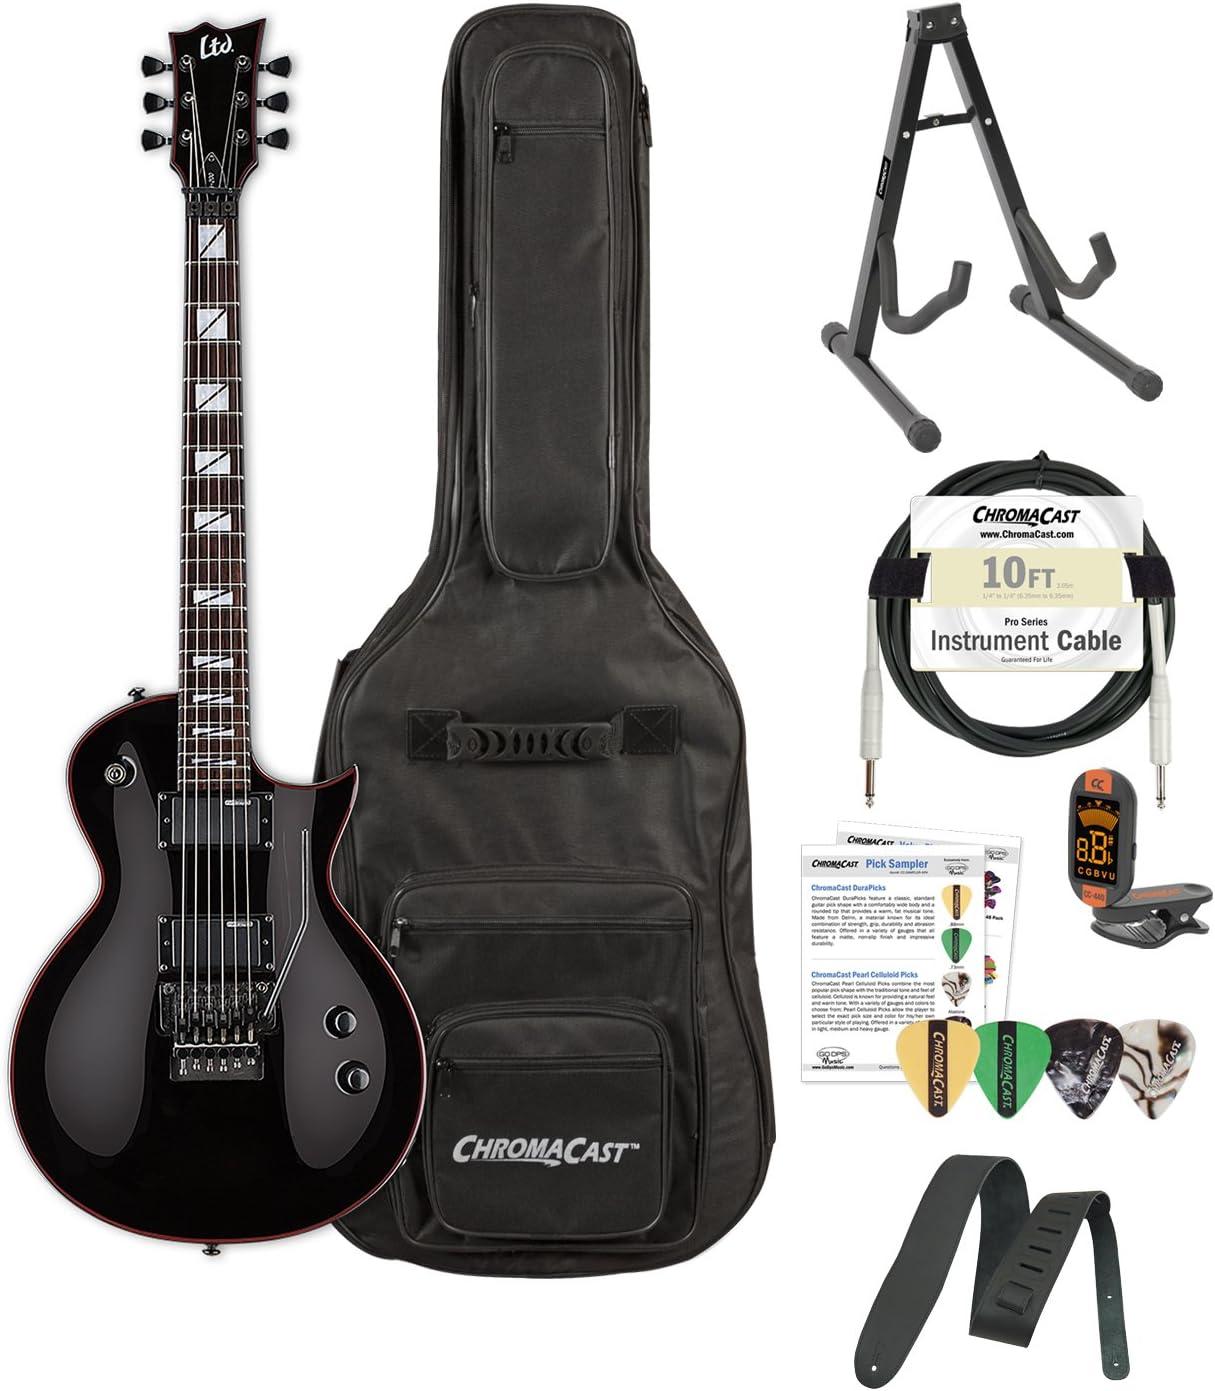 Esp lgh200blk-kit01 BLK Gary Holt Slayer Negro Guitarra eléctrica ...